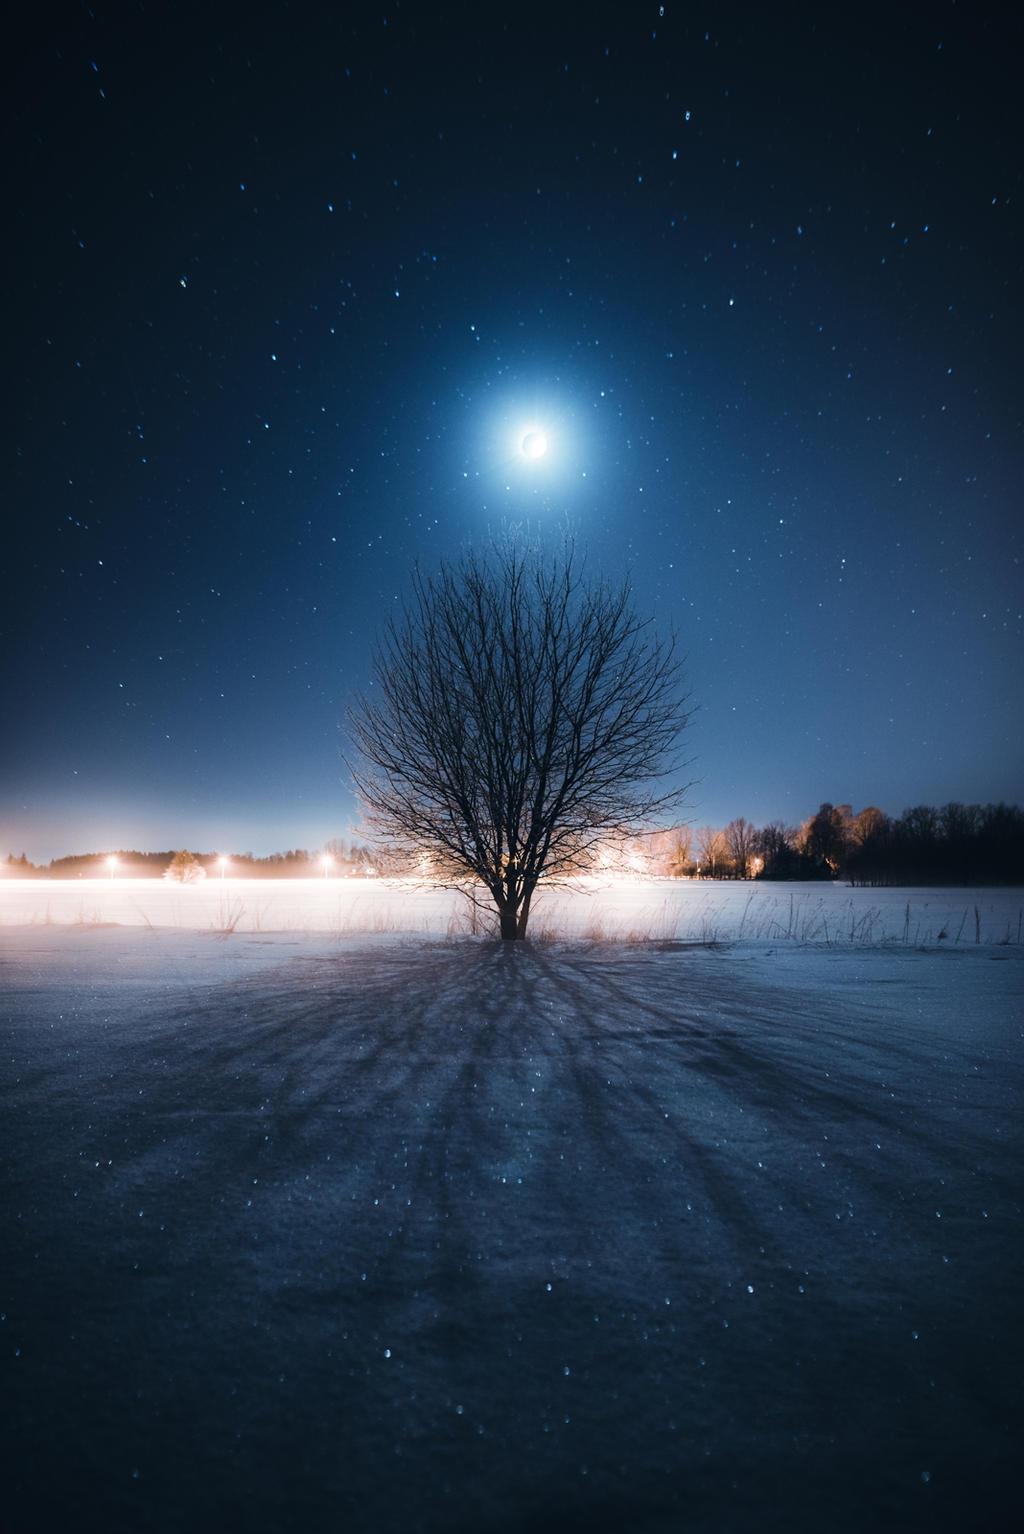 Moonlight and shadow by HendrikMandla